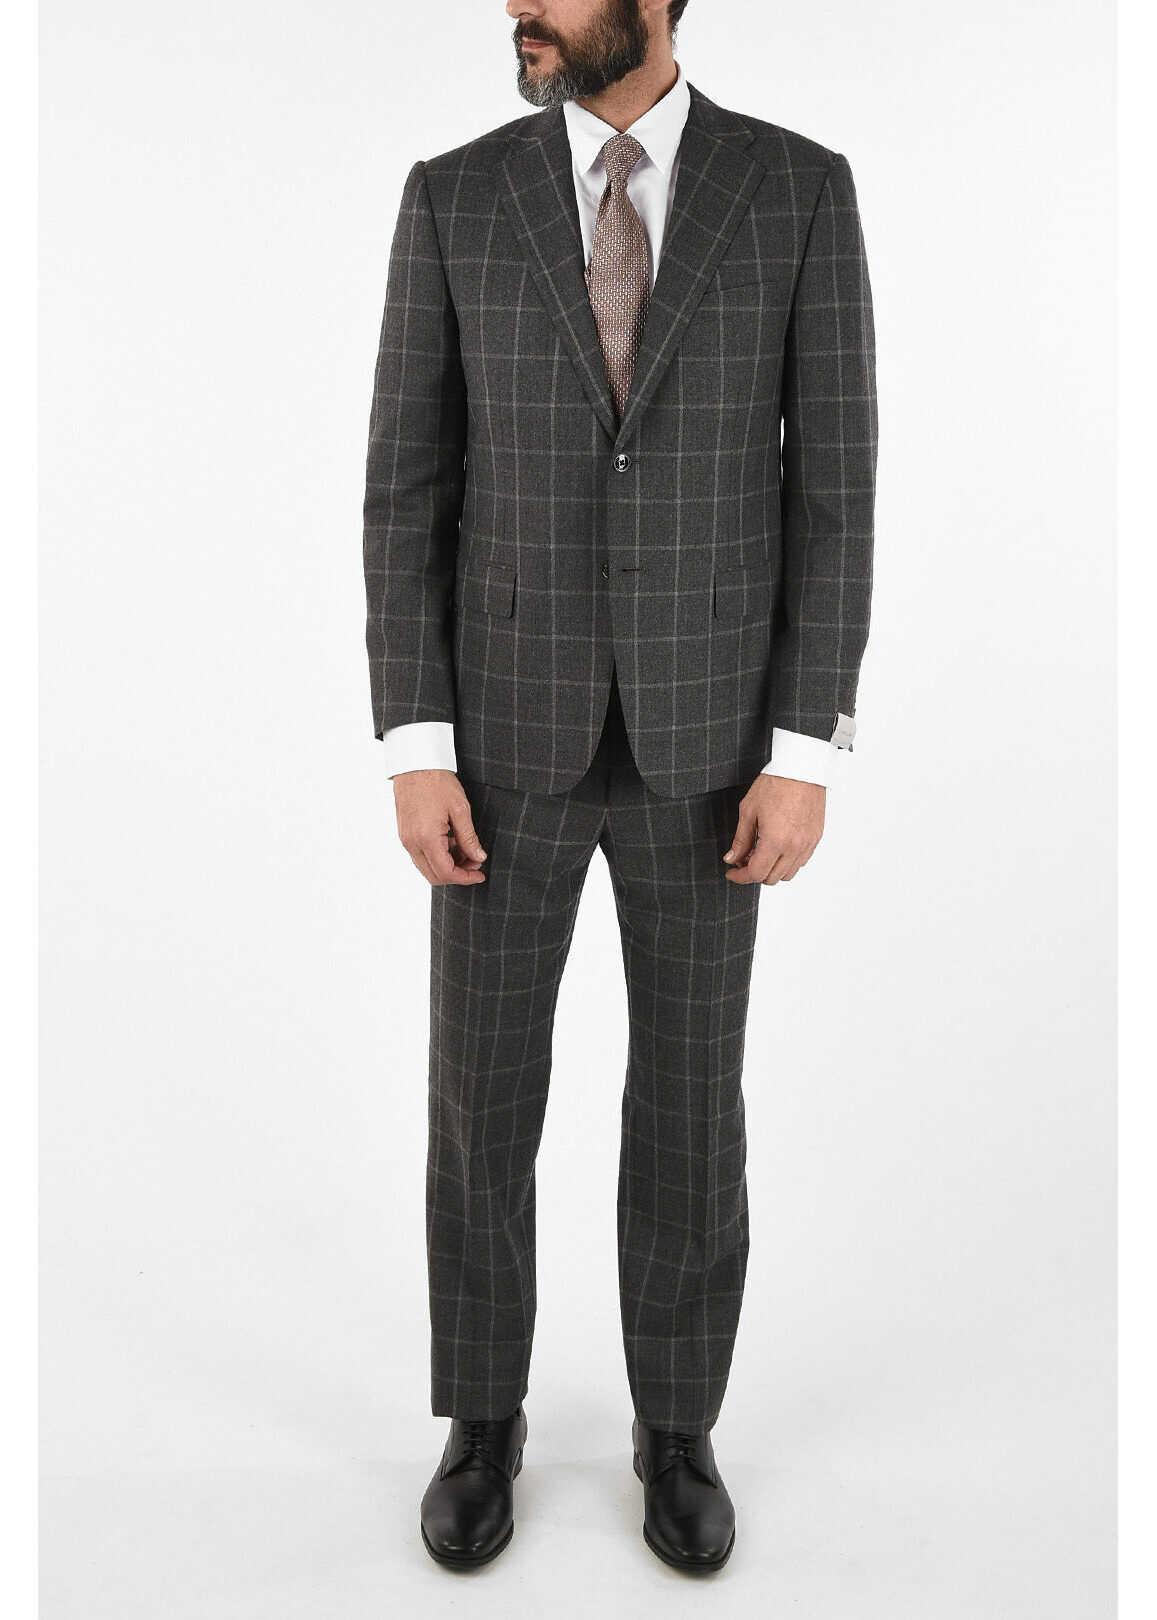 CORNELIANI windowpane check wool and cashmere drop 6R 2-button MANTUA s GRAY imagine